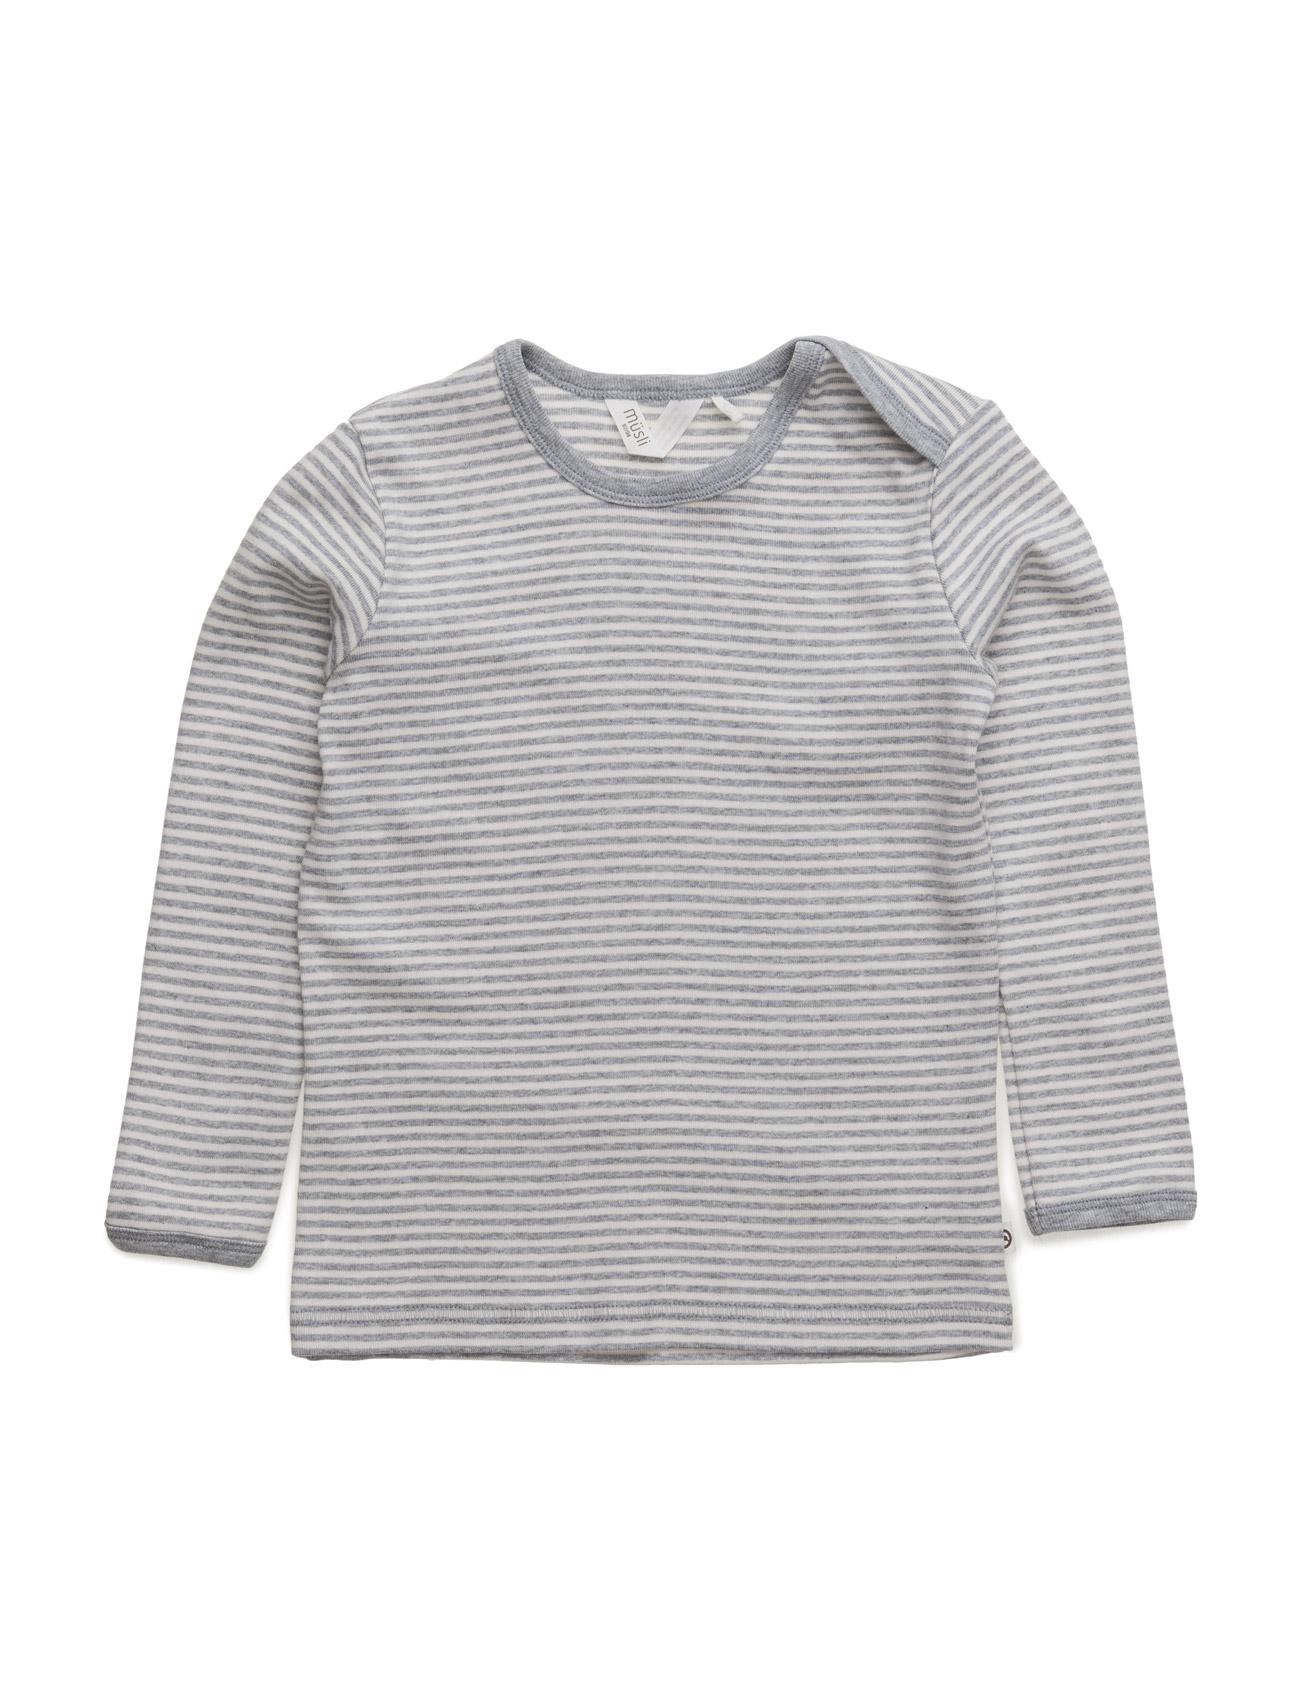 mã¼sli by green cotton – Stripe l/sl t på boozt.com dk